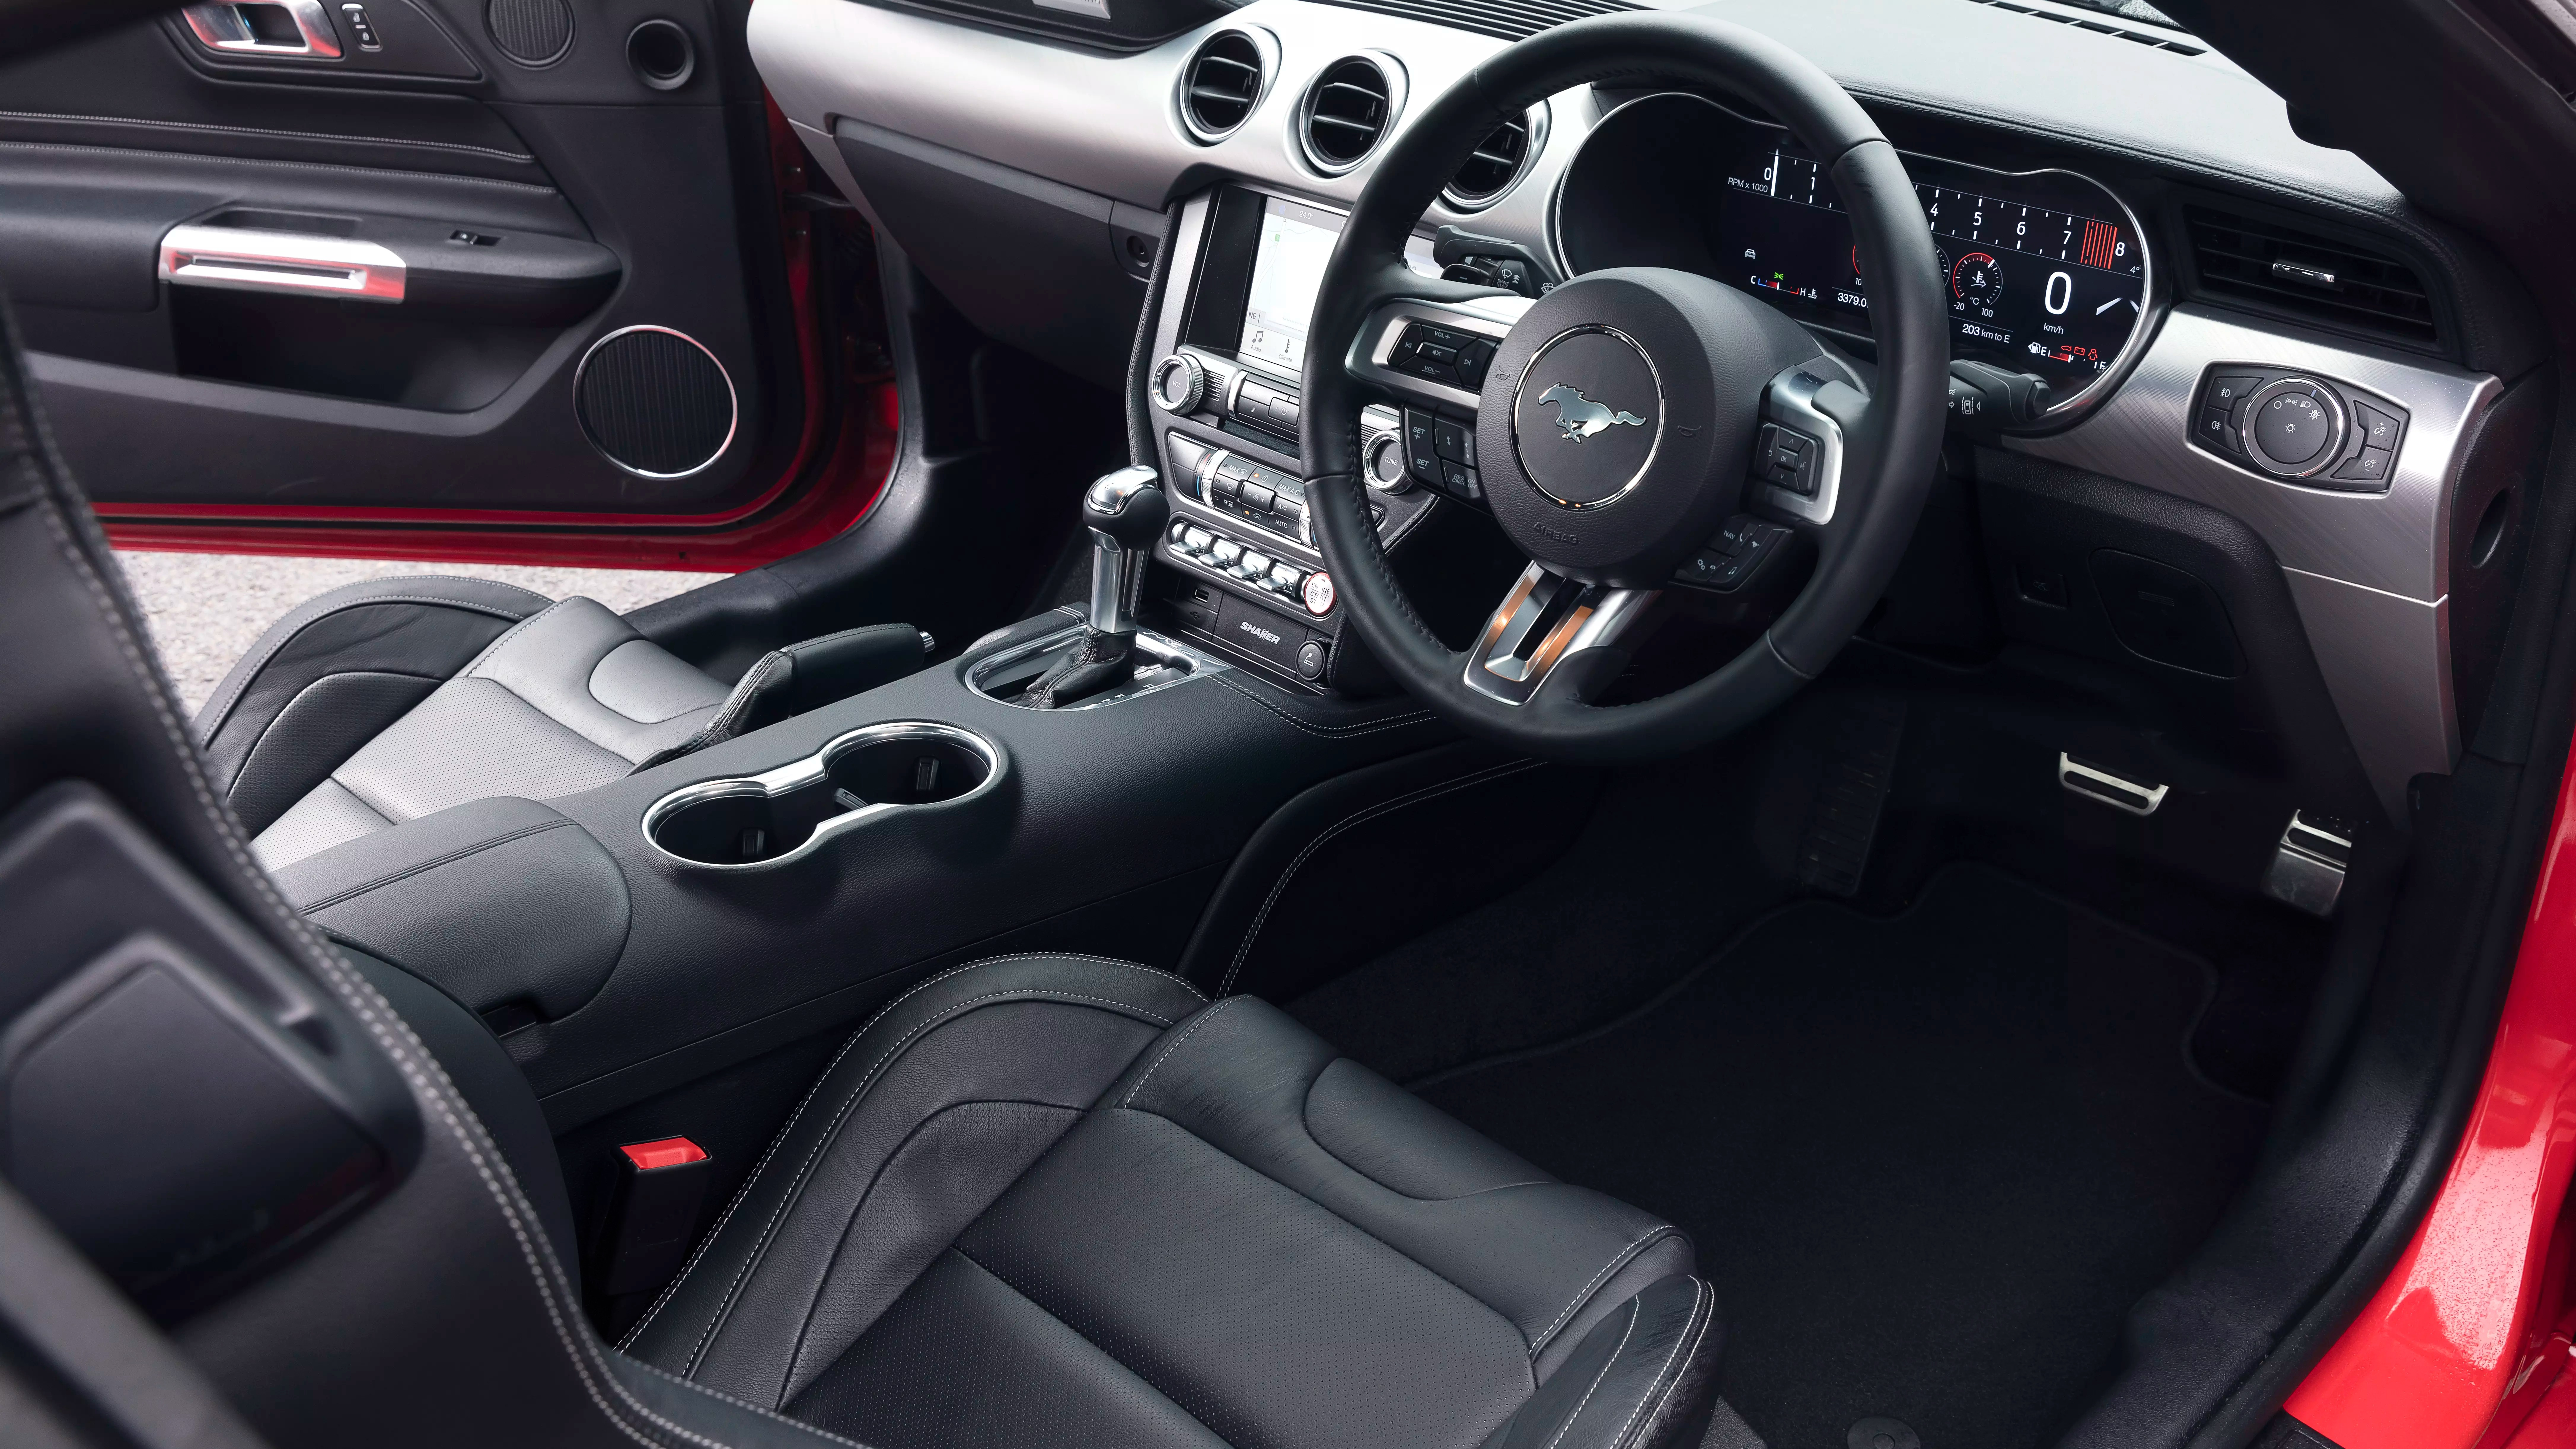 HSV Chevrolet Camaro price announced